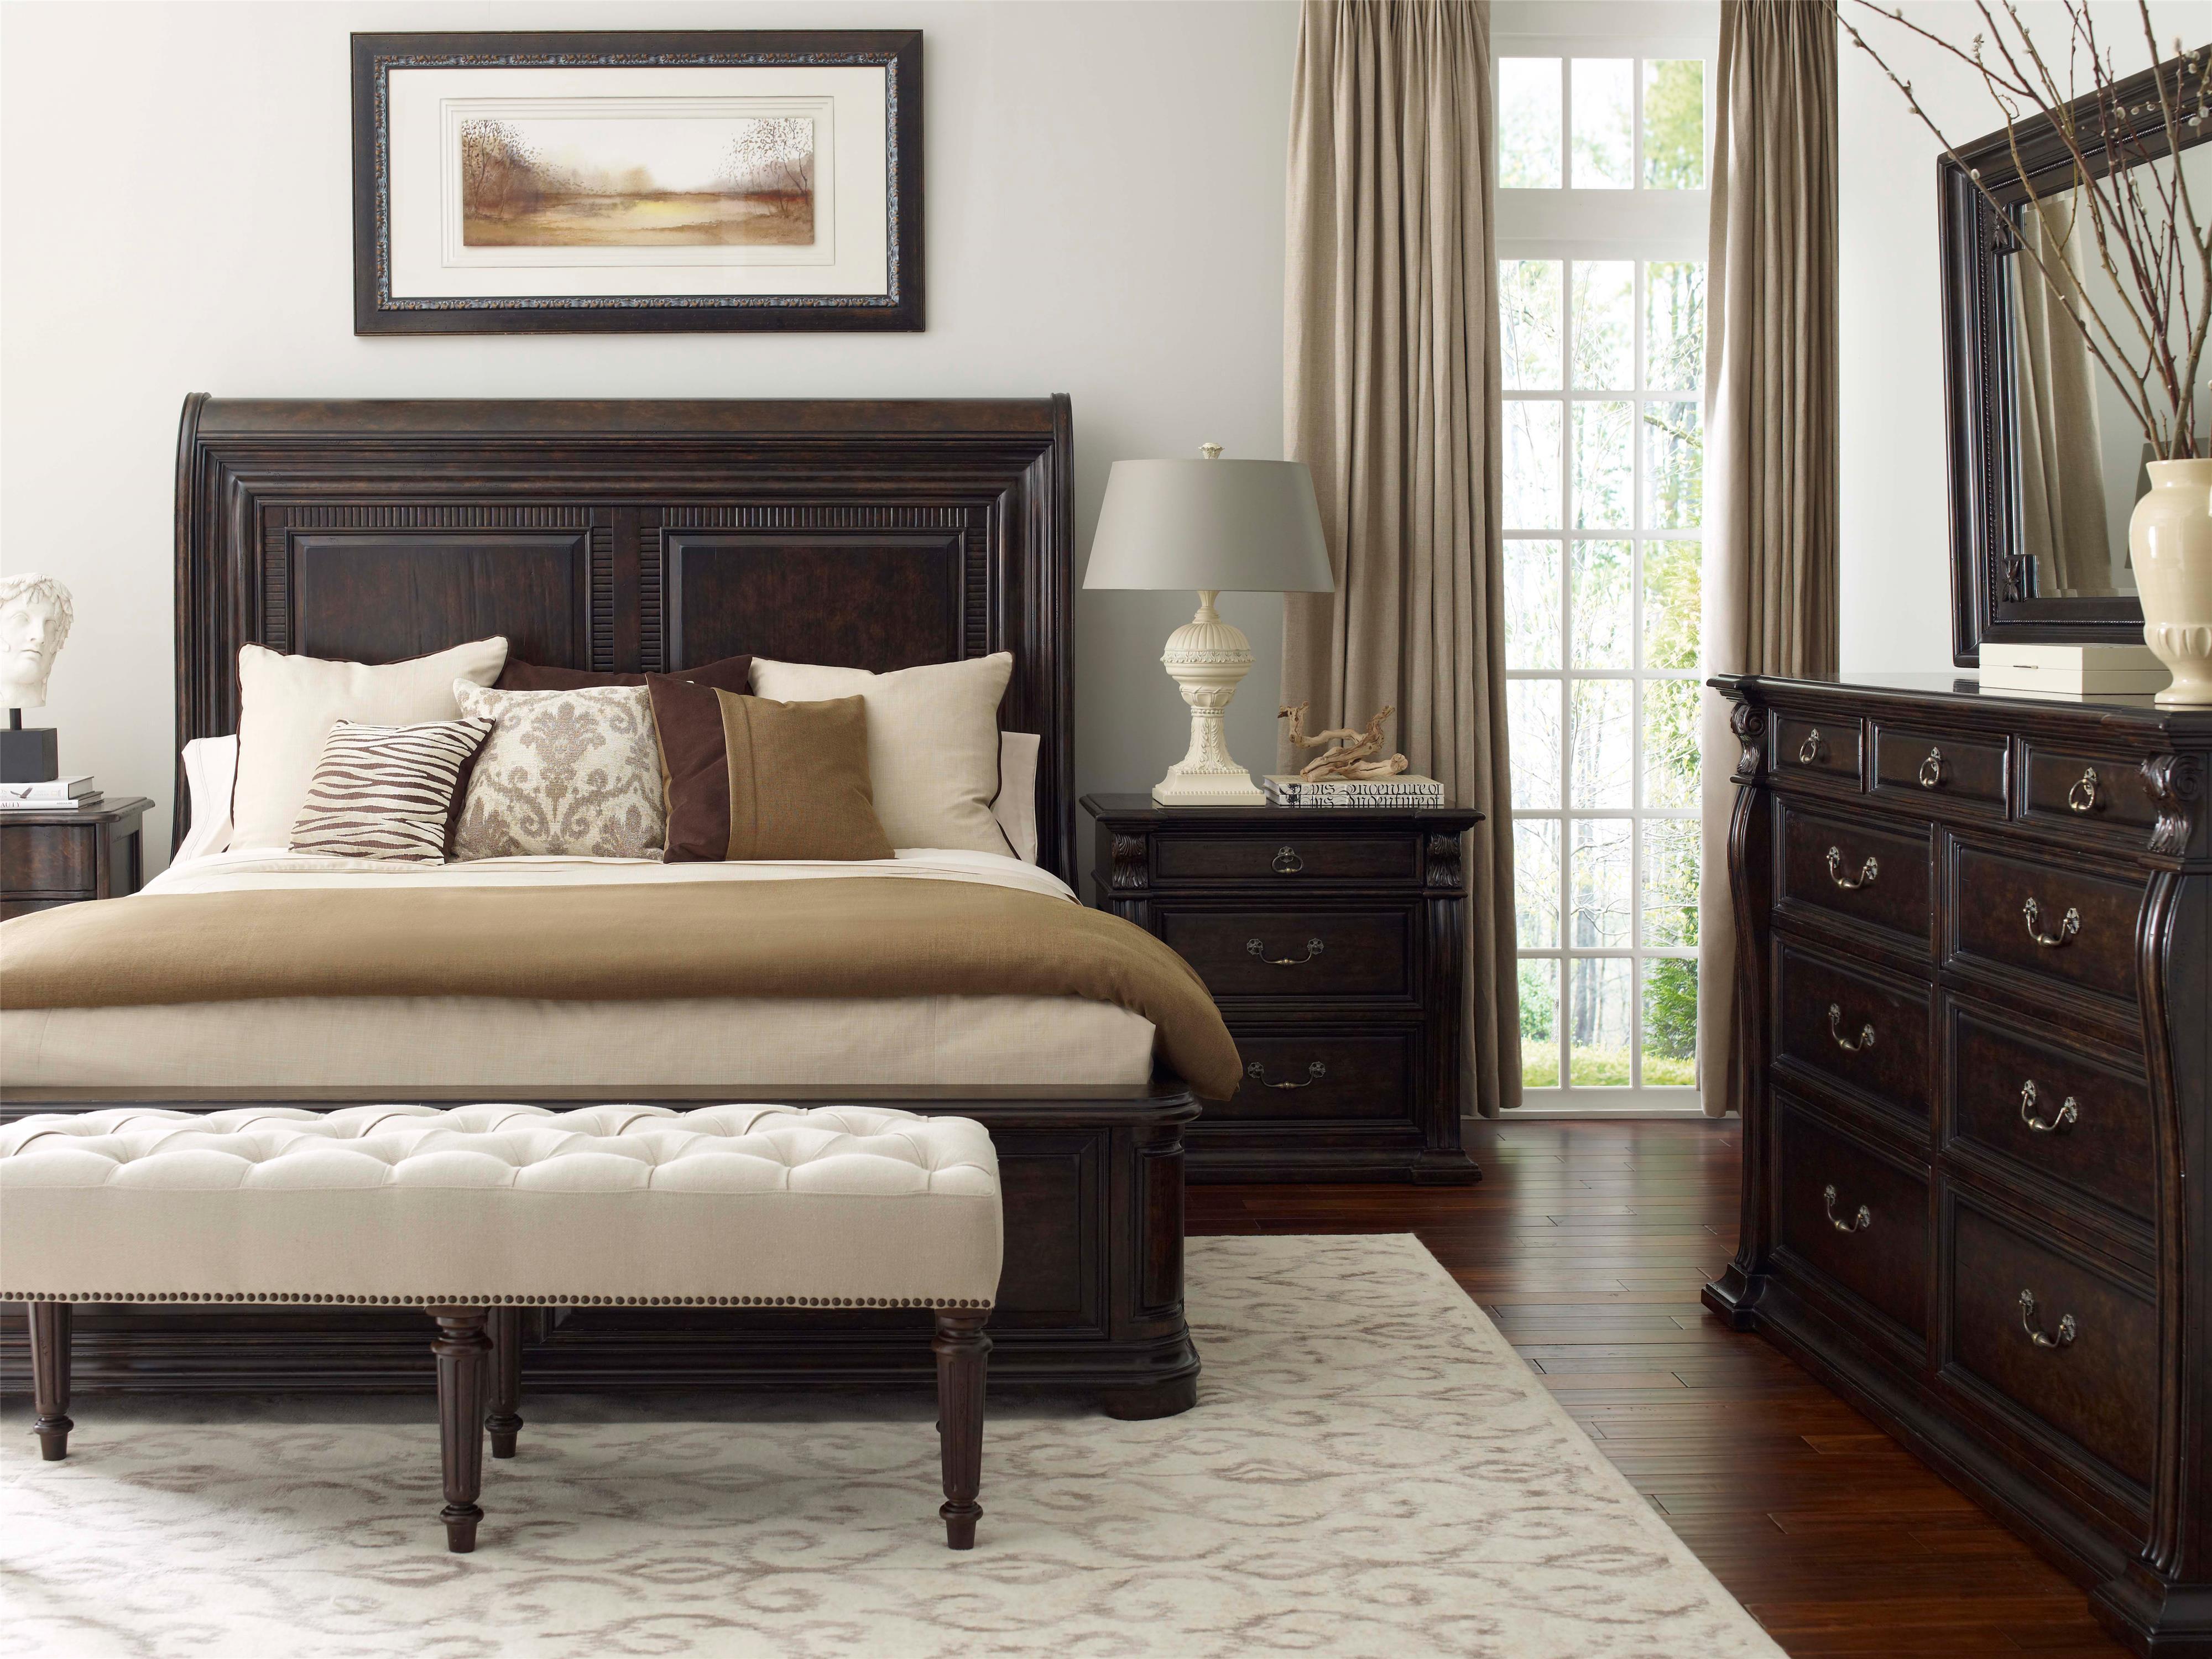 Belfort Signature Belle Haven King Bedroom Group - Item Number: 21700-2615 K Bedroom Group 1